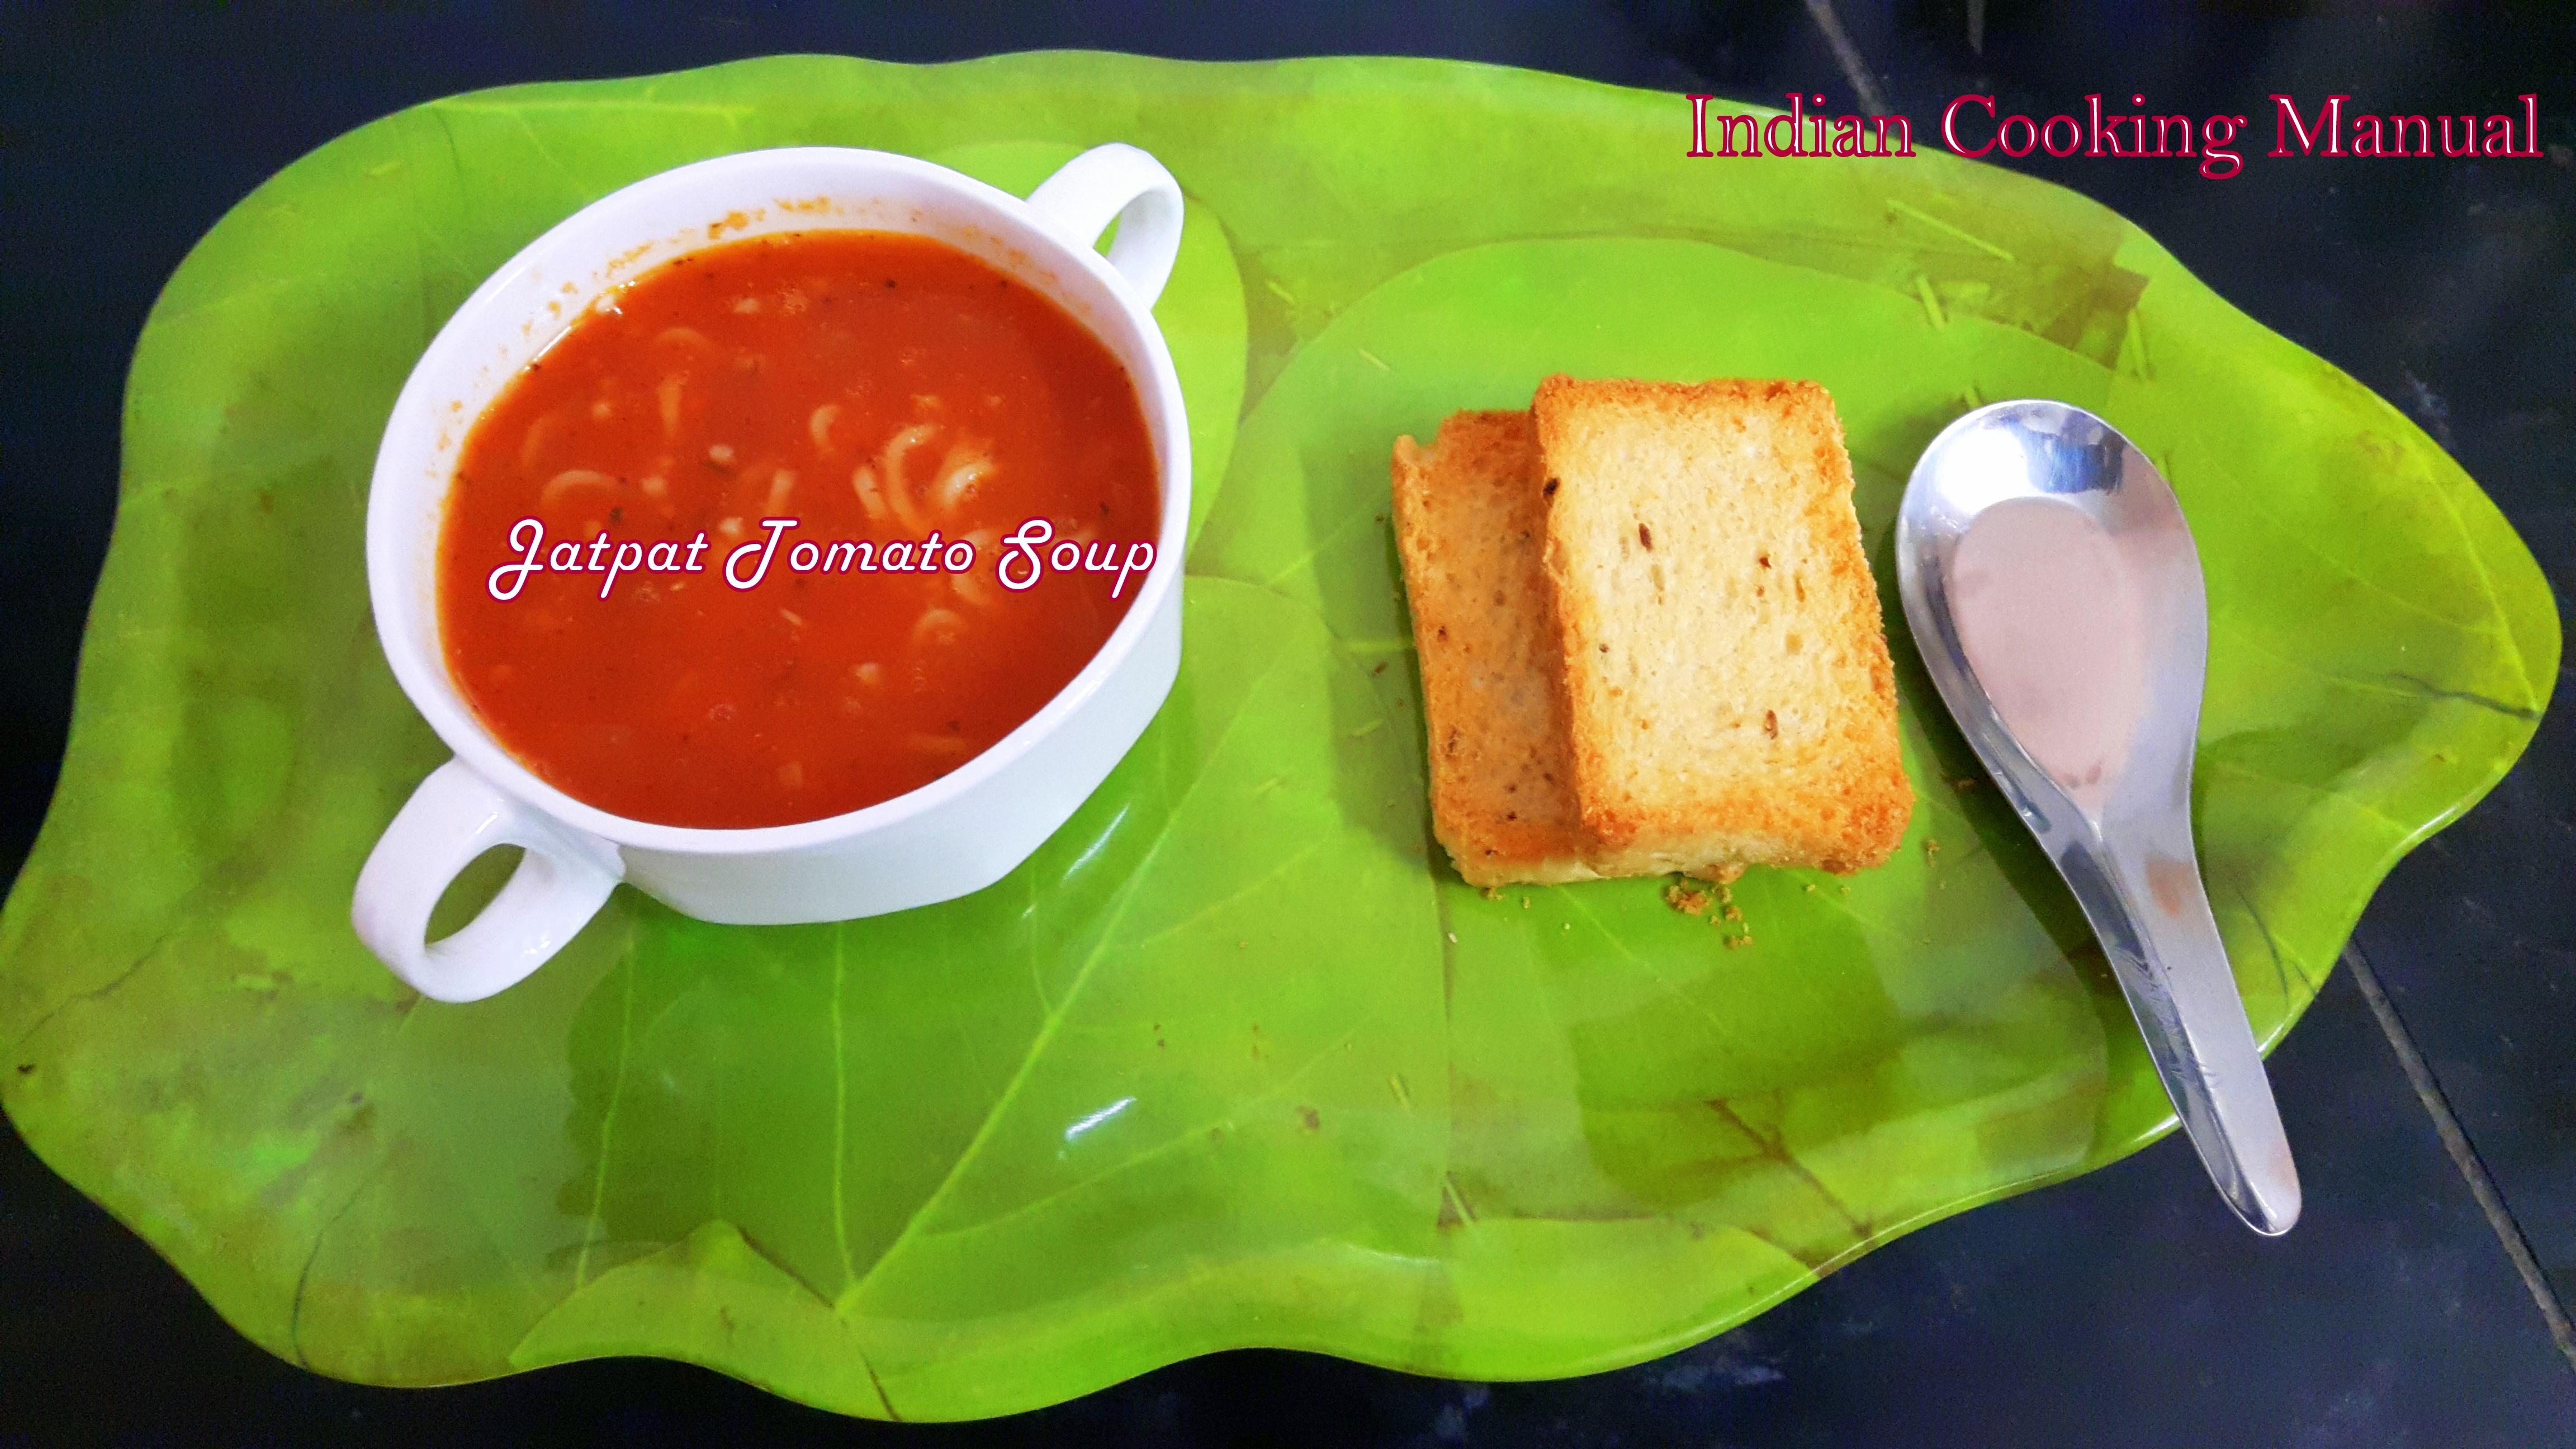 Jhatpat tomato soup